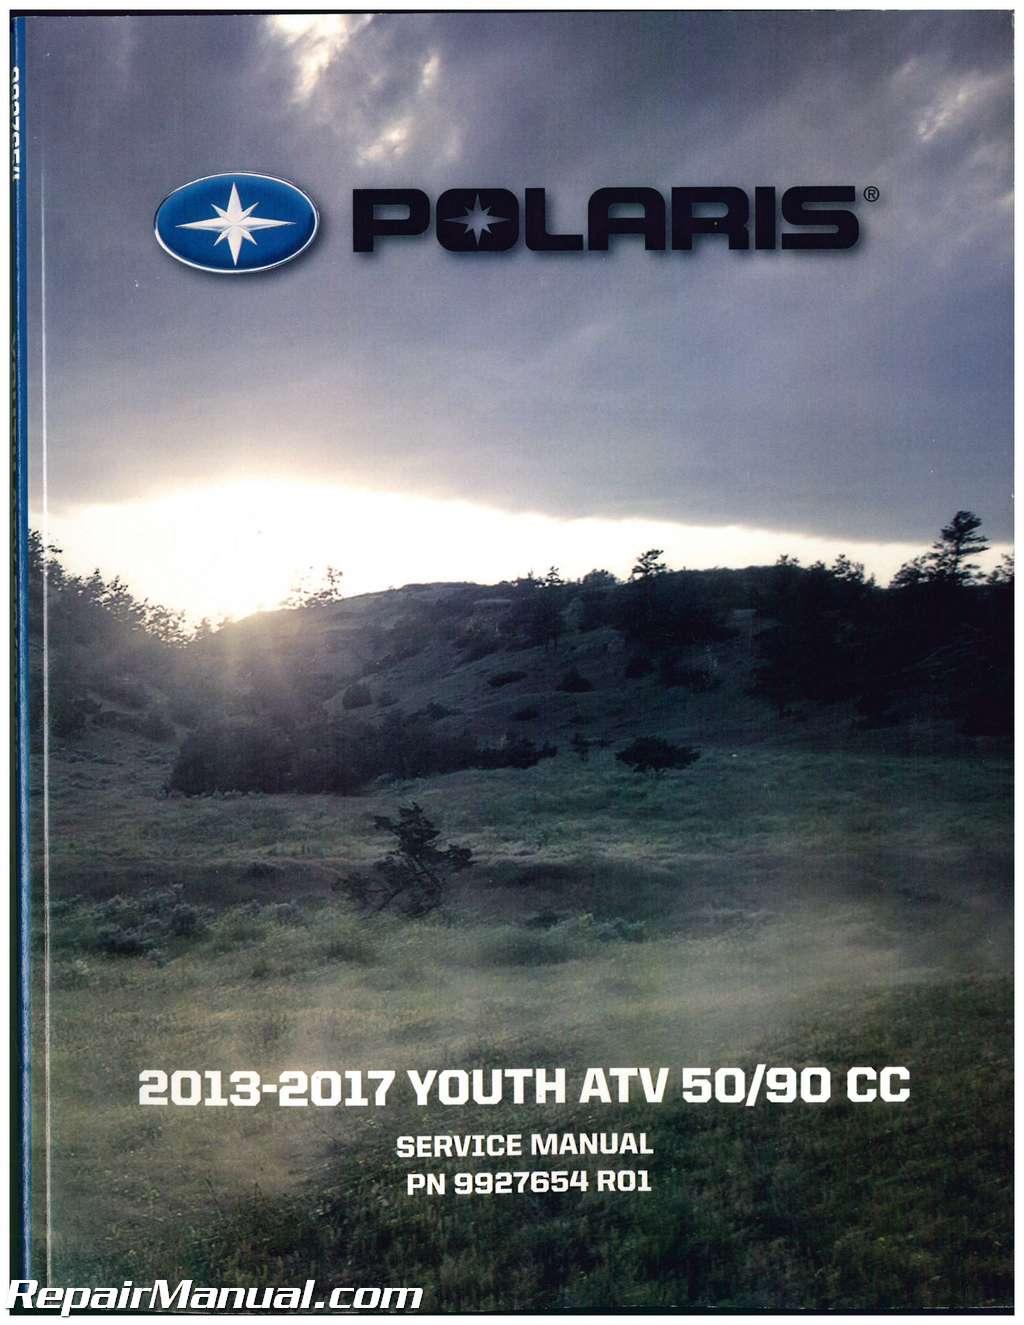 2013 2017 Polaris Youth 50 90 Atv Service Repair Manual Predator Fuel Filter